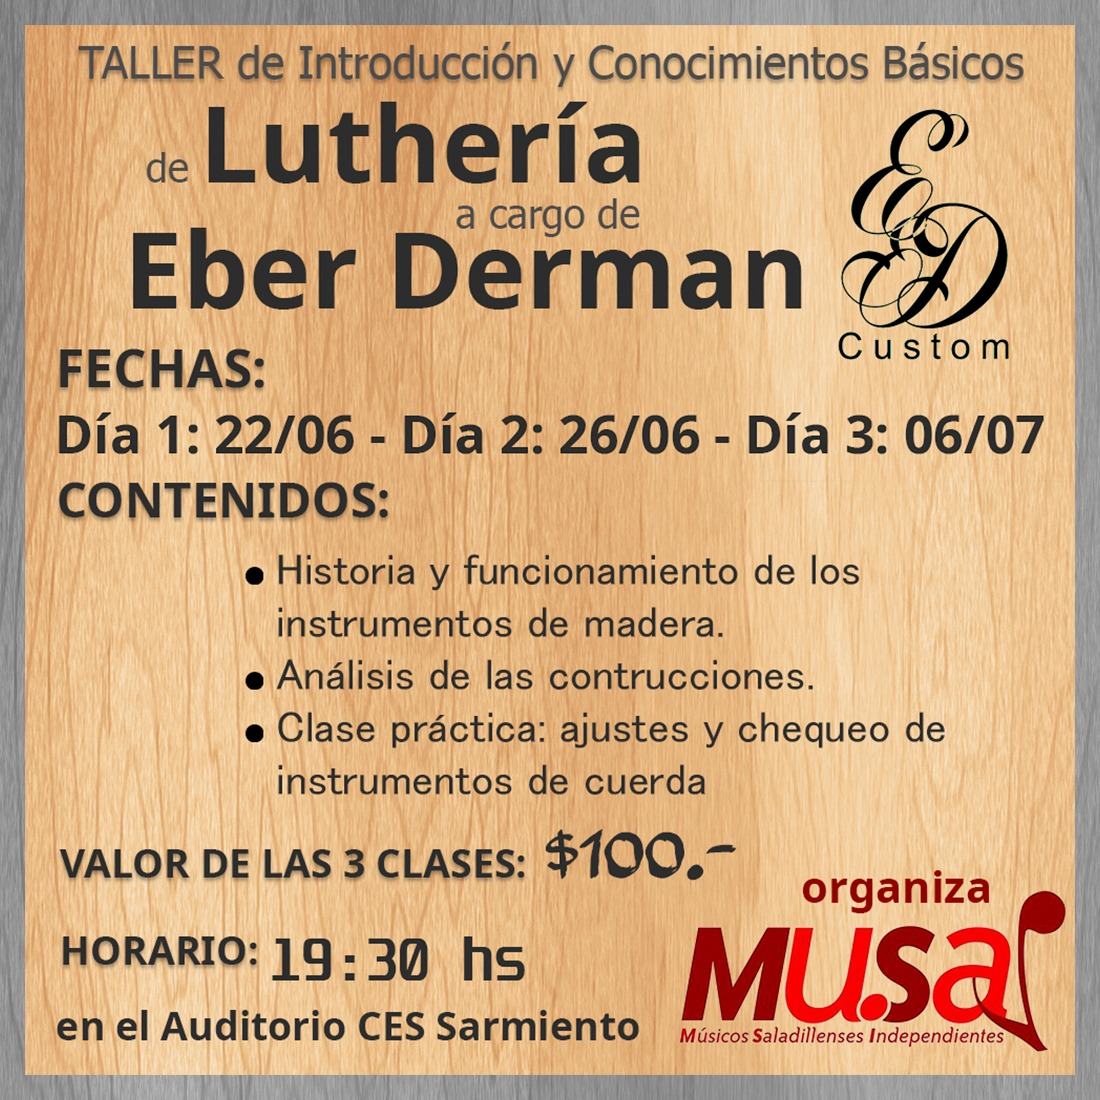 2018 06 14 taller lutheria Eber derman